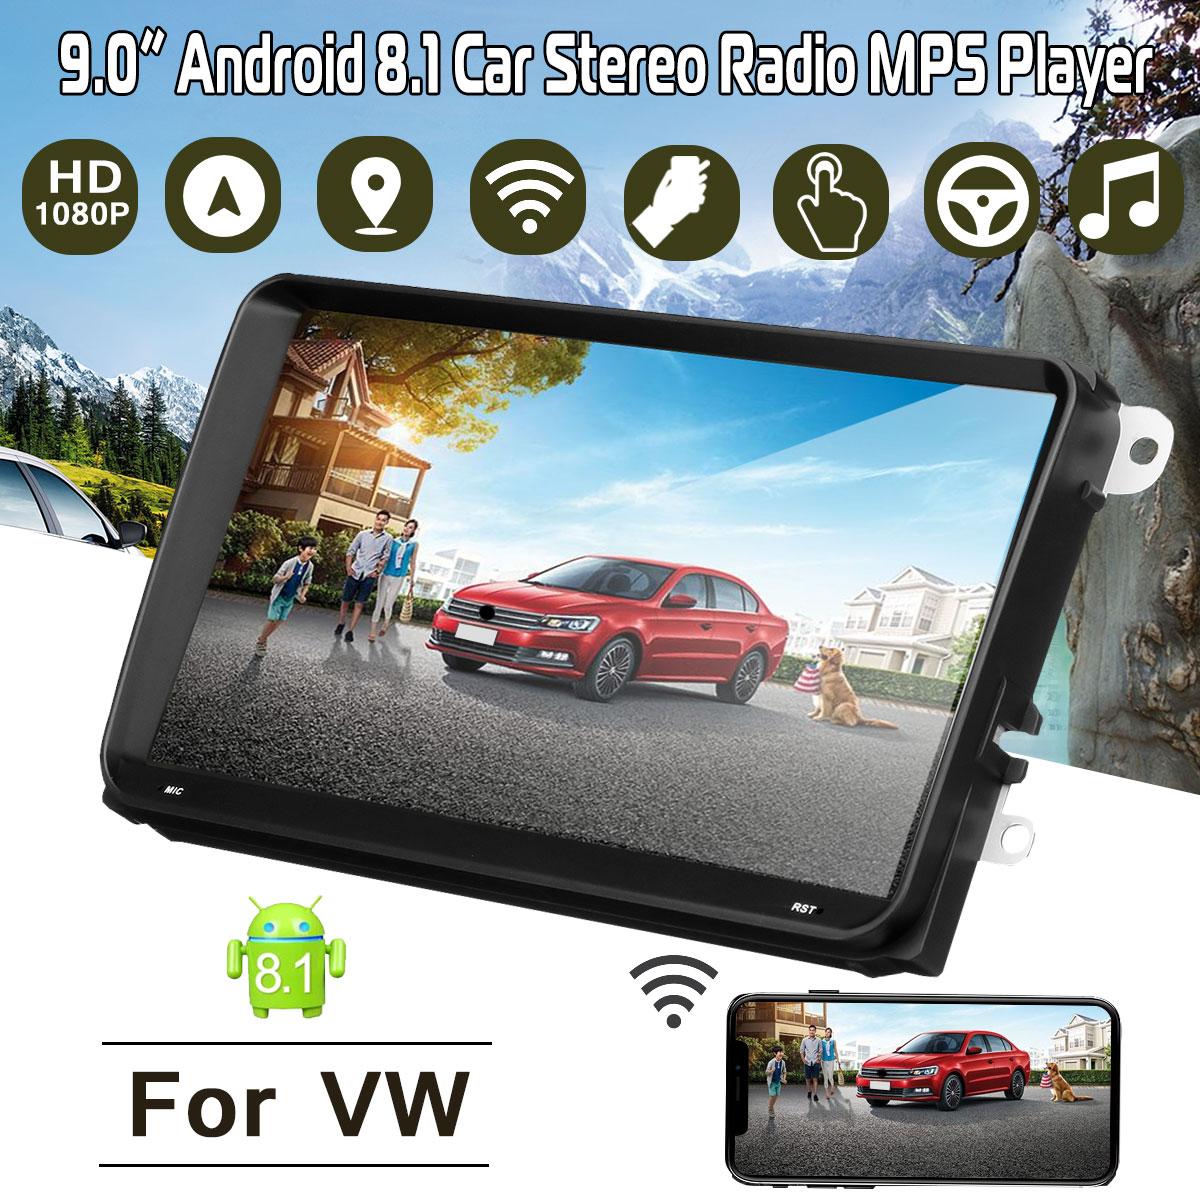 GreenYi Video Camera Parking Sensor Kit Front and Rear Radar Detector 2 Cameras for Car Rear